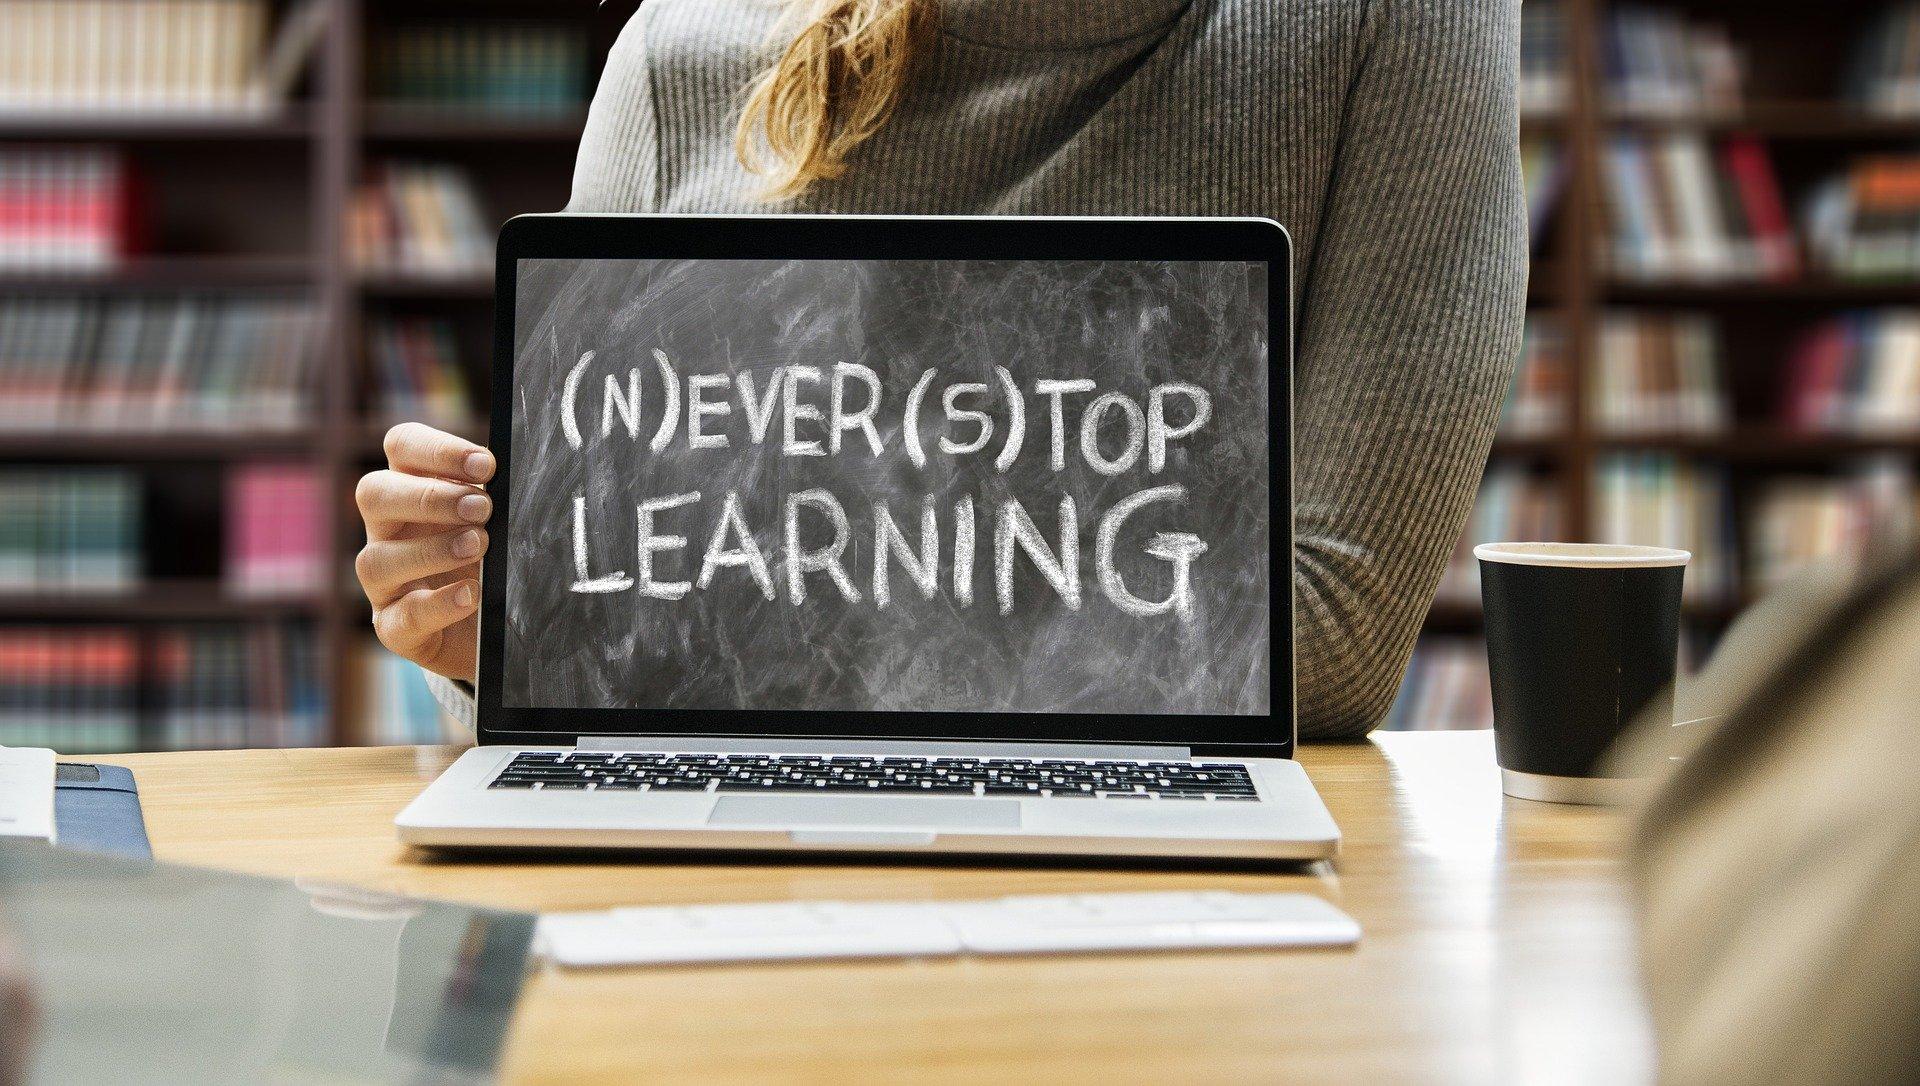 Musikunterricht Online - Erfolg trotz Corona-Krise